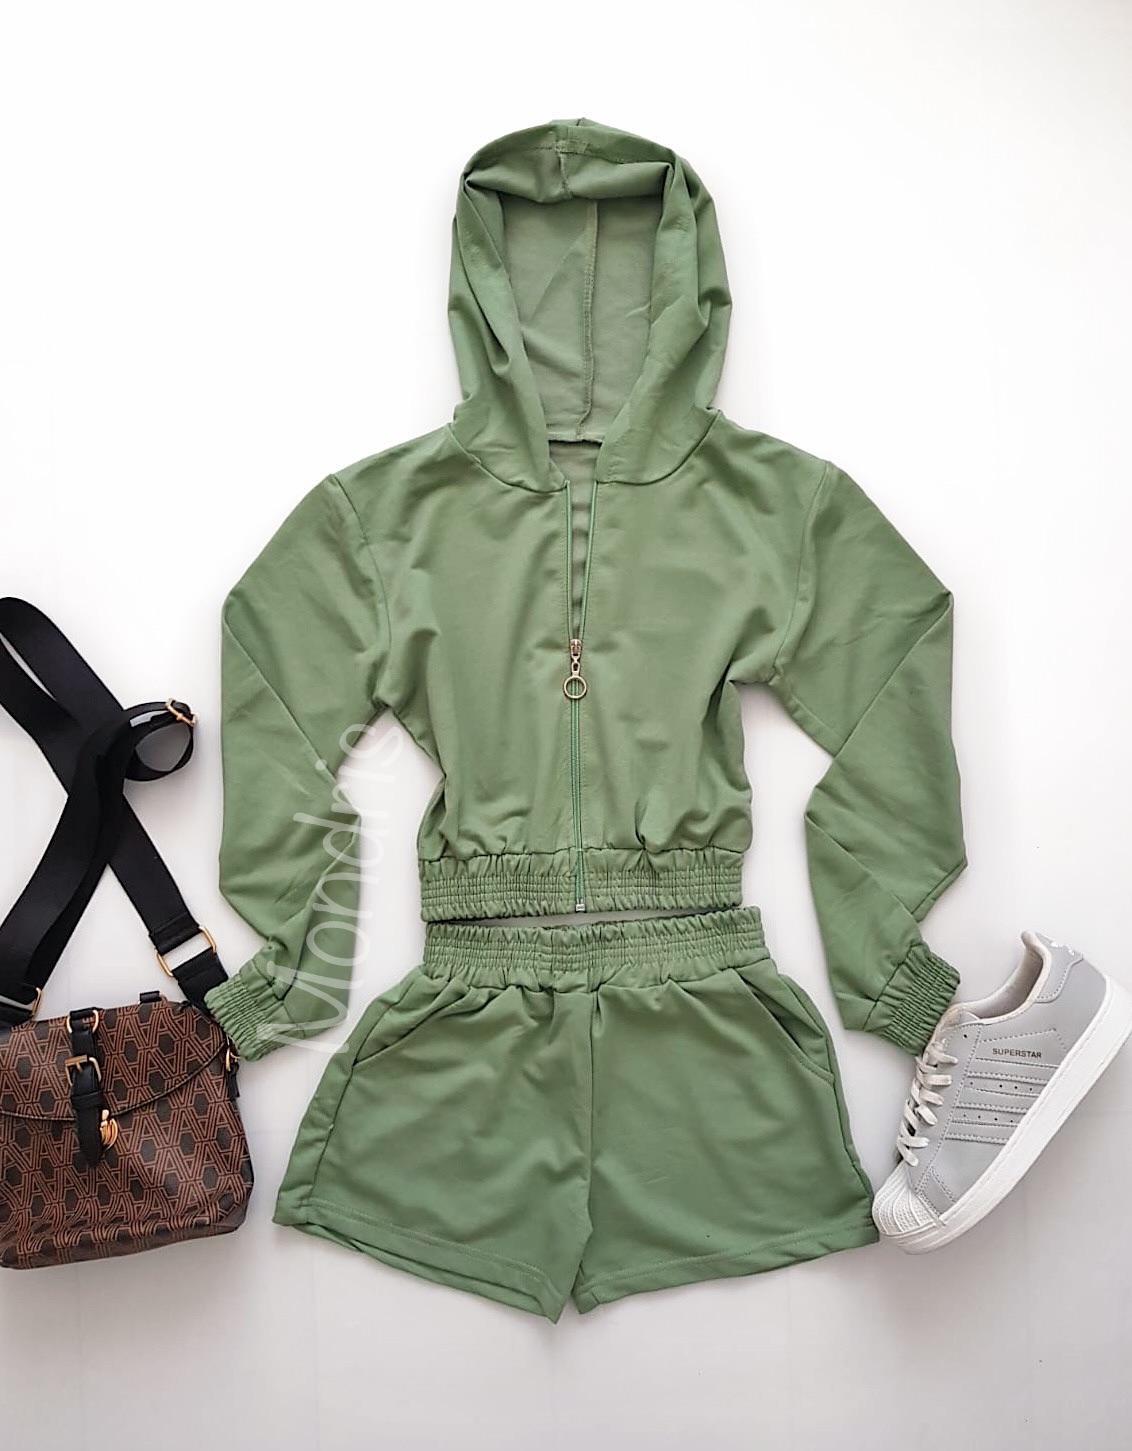 Compleu dama din bumbac verde compus din pantaloni scurti si hanorac scurt